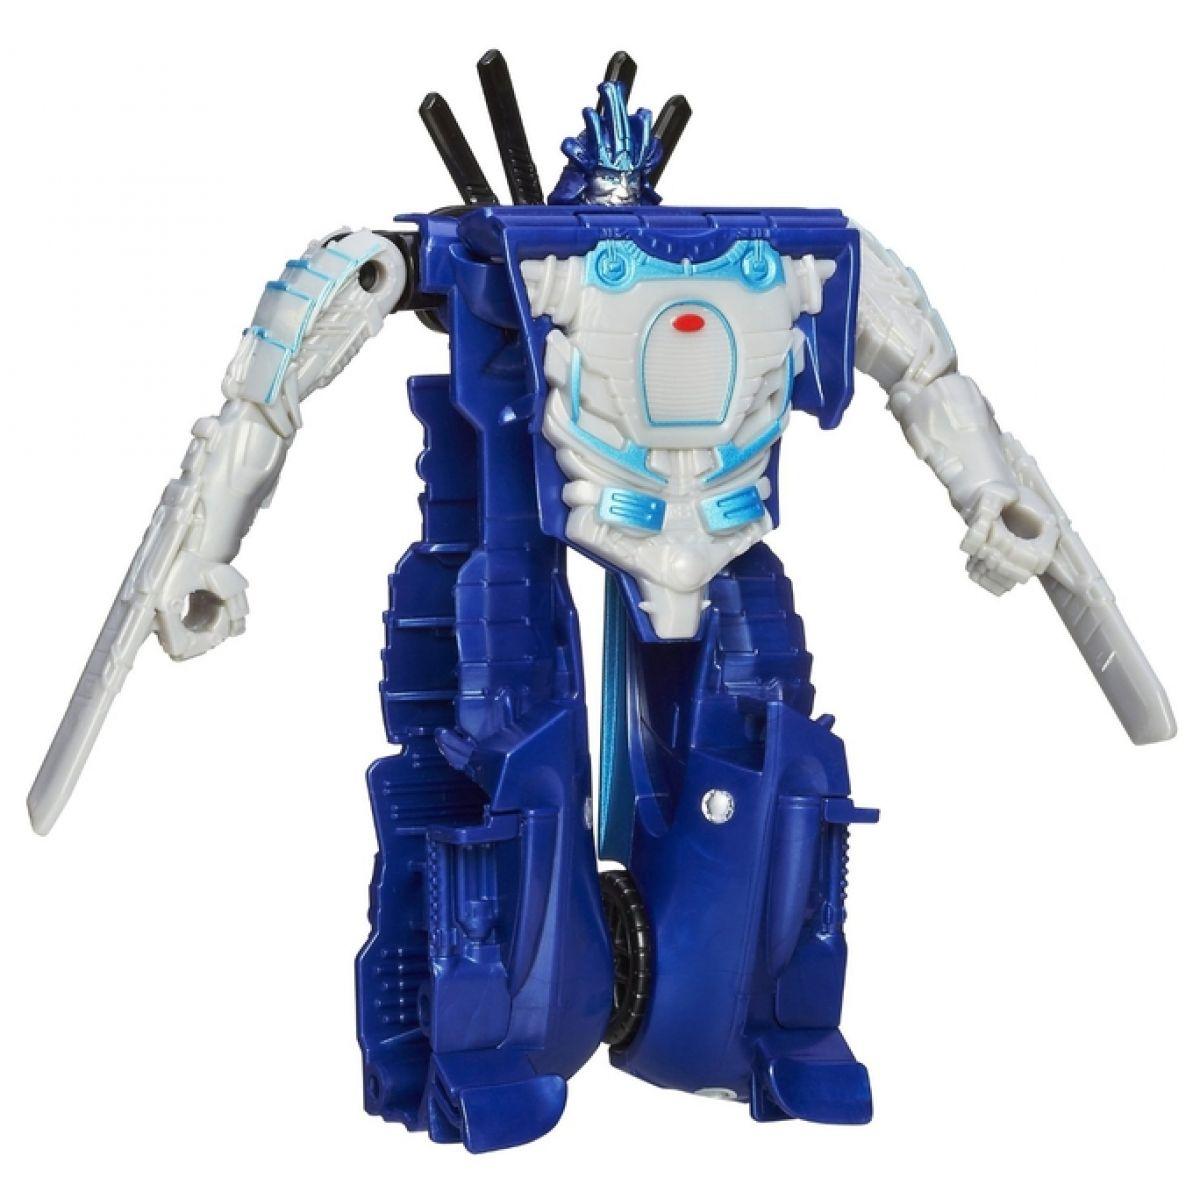 Hasbro Transformers 4 Transformace v 1 kroku - Autobot Drift